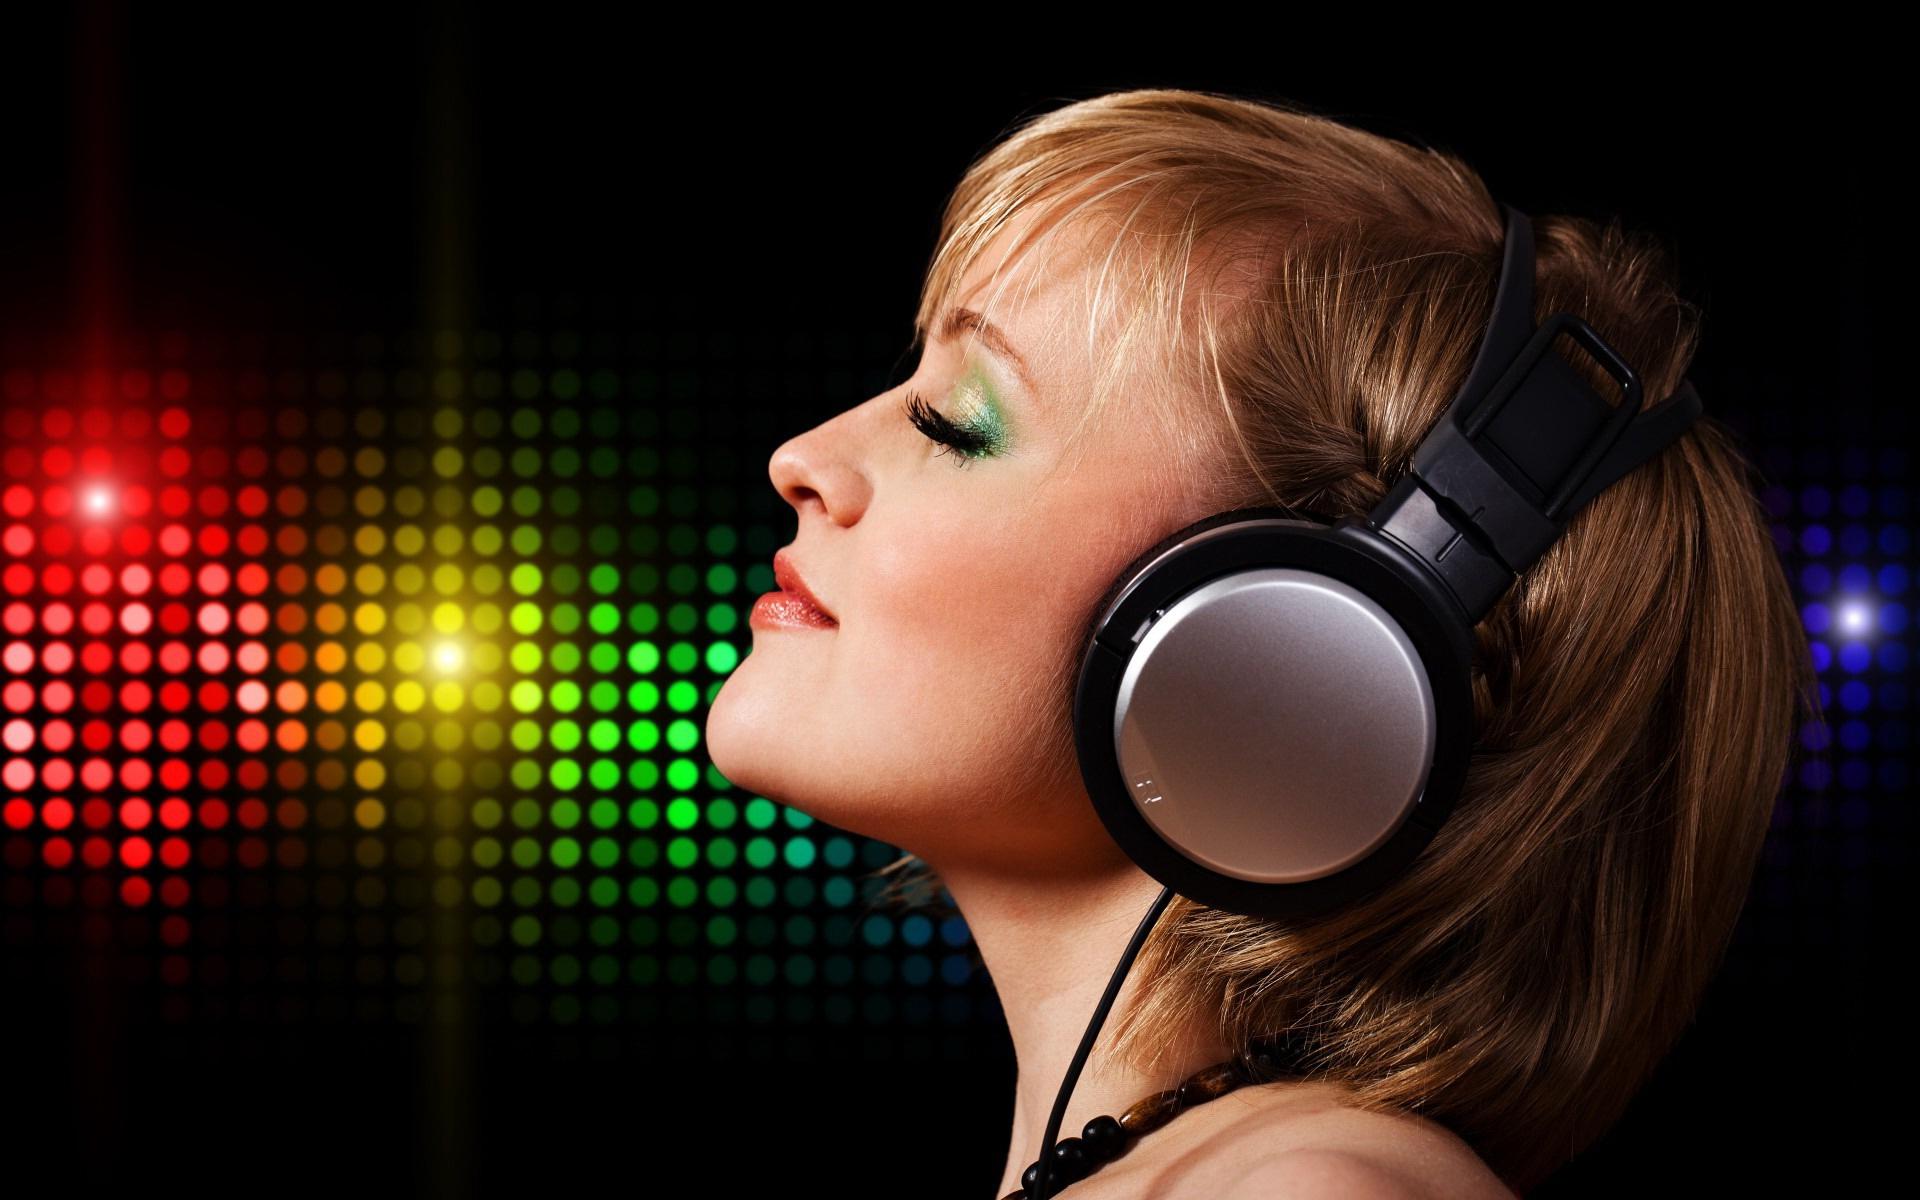 Description Music Girl Wallpaper HD is a hi res Wallpaper for pc 1920x1200